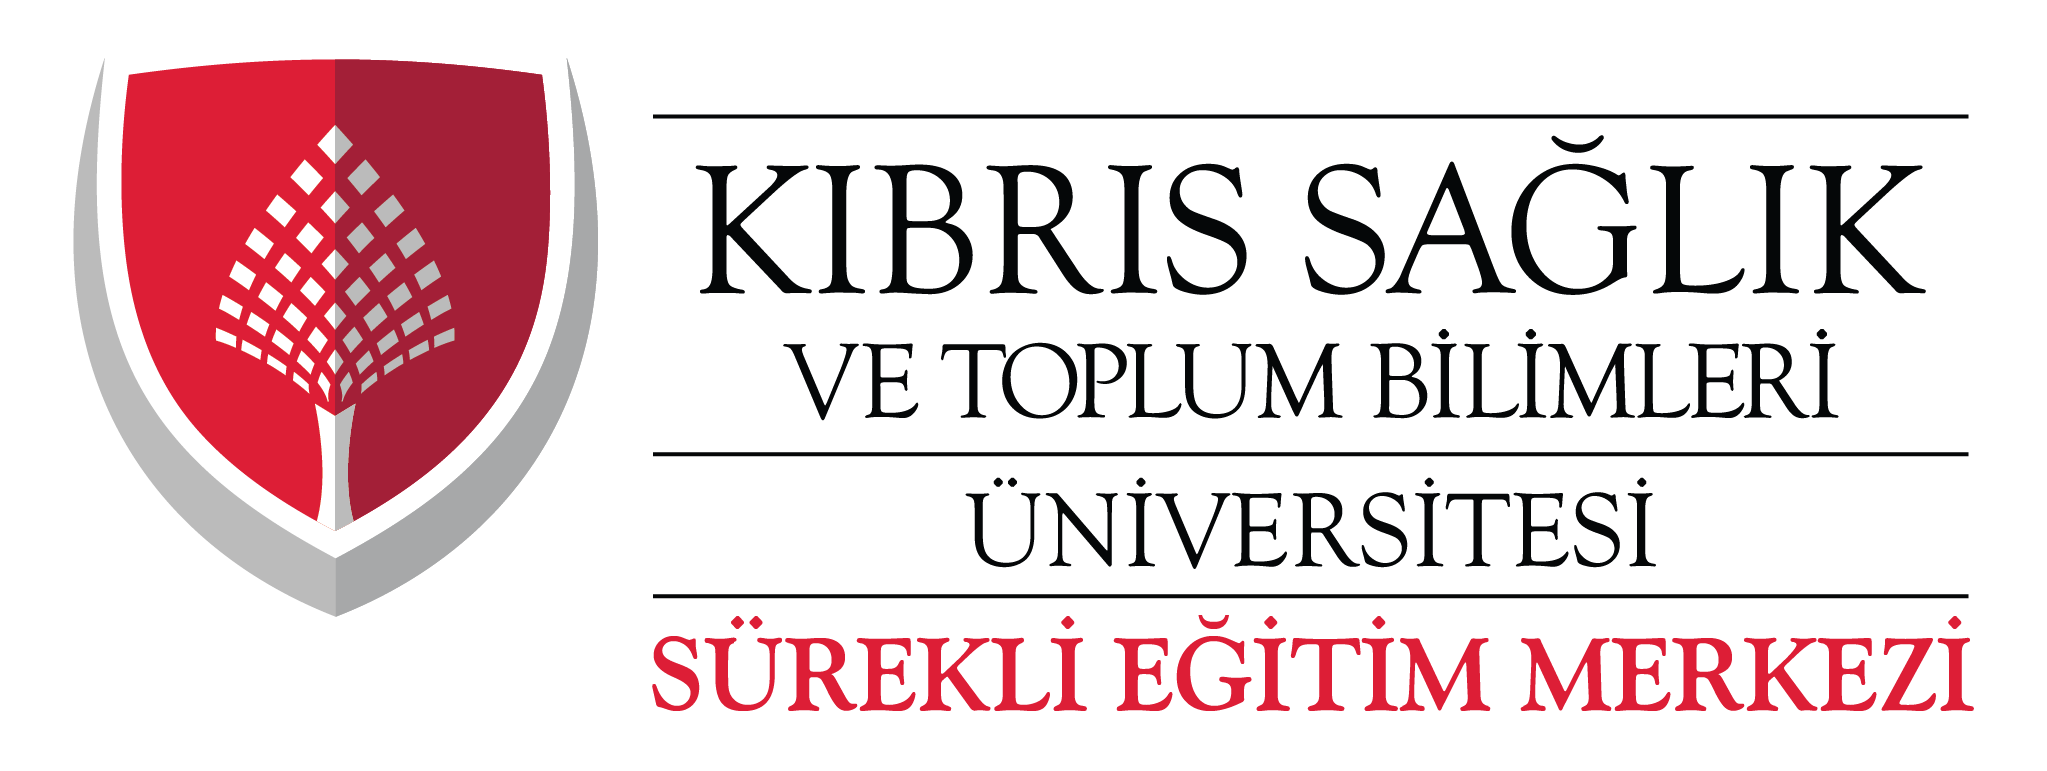 Sürekli Eğitim Merkezi logo